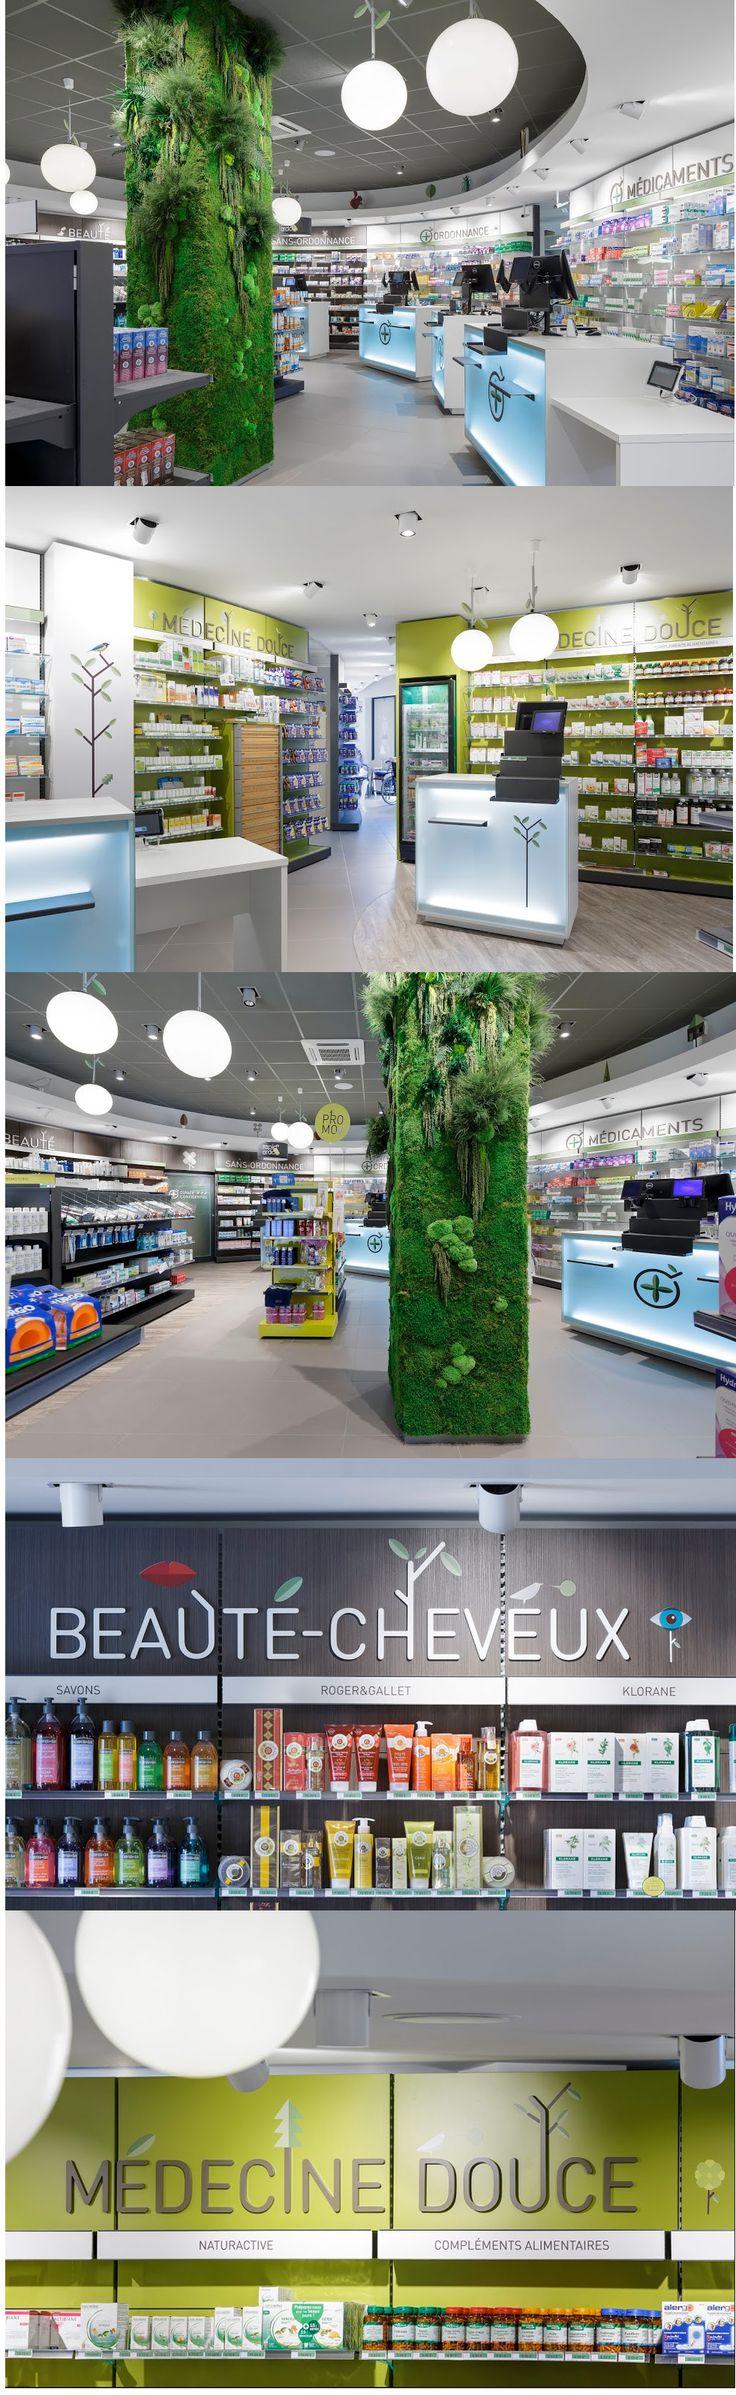 Agencement d'une Pharmacie - #designdespace #signaletique #pharmacie